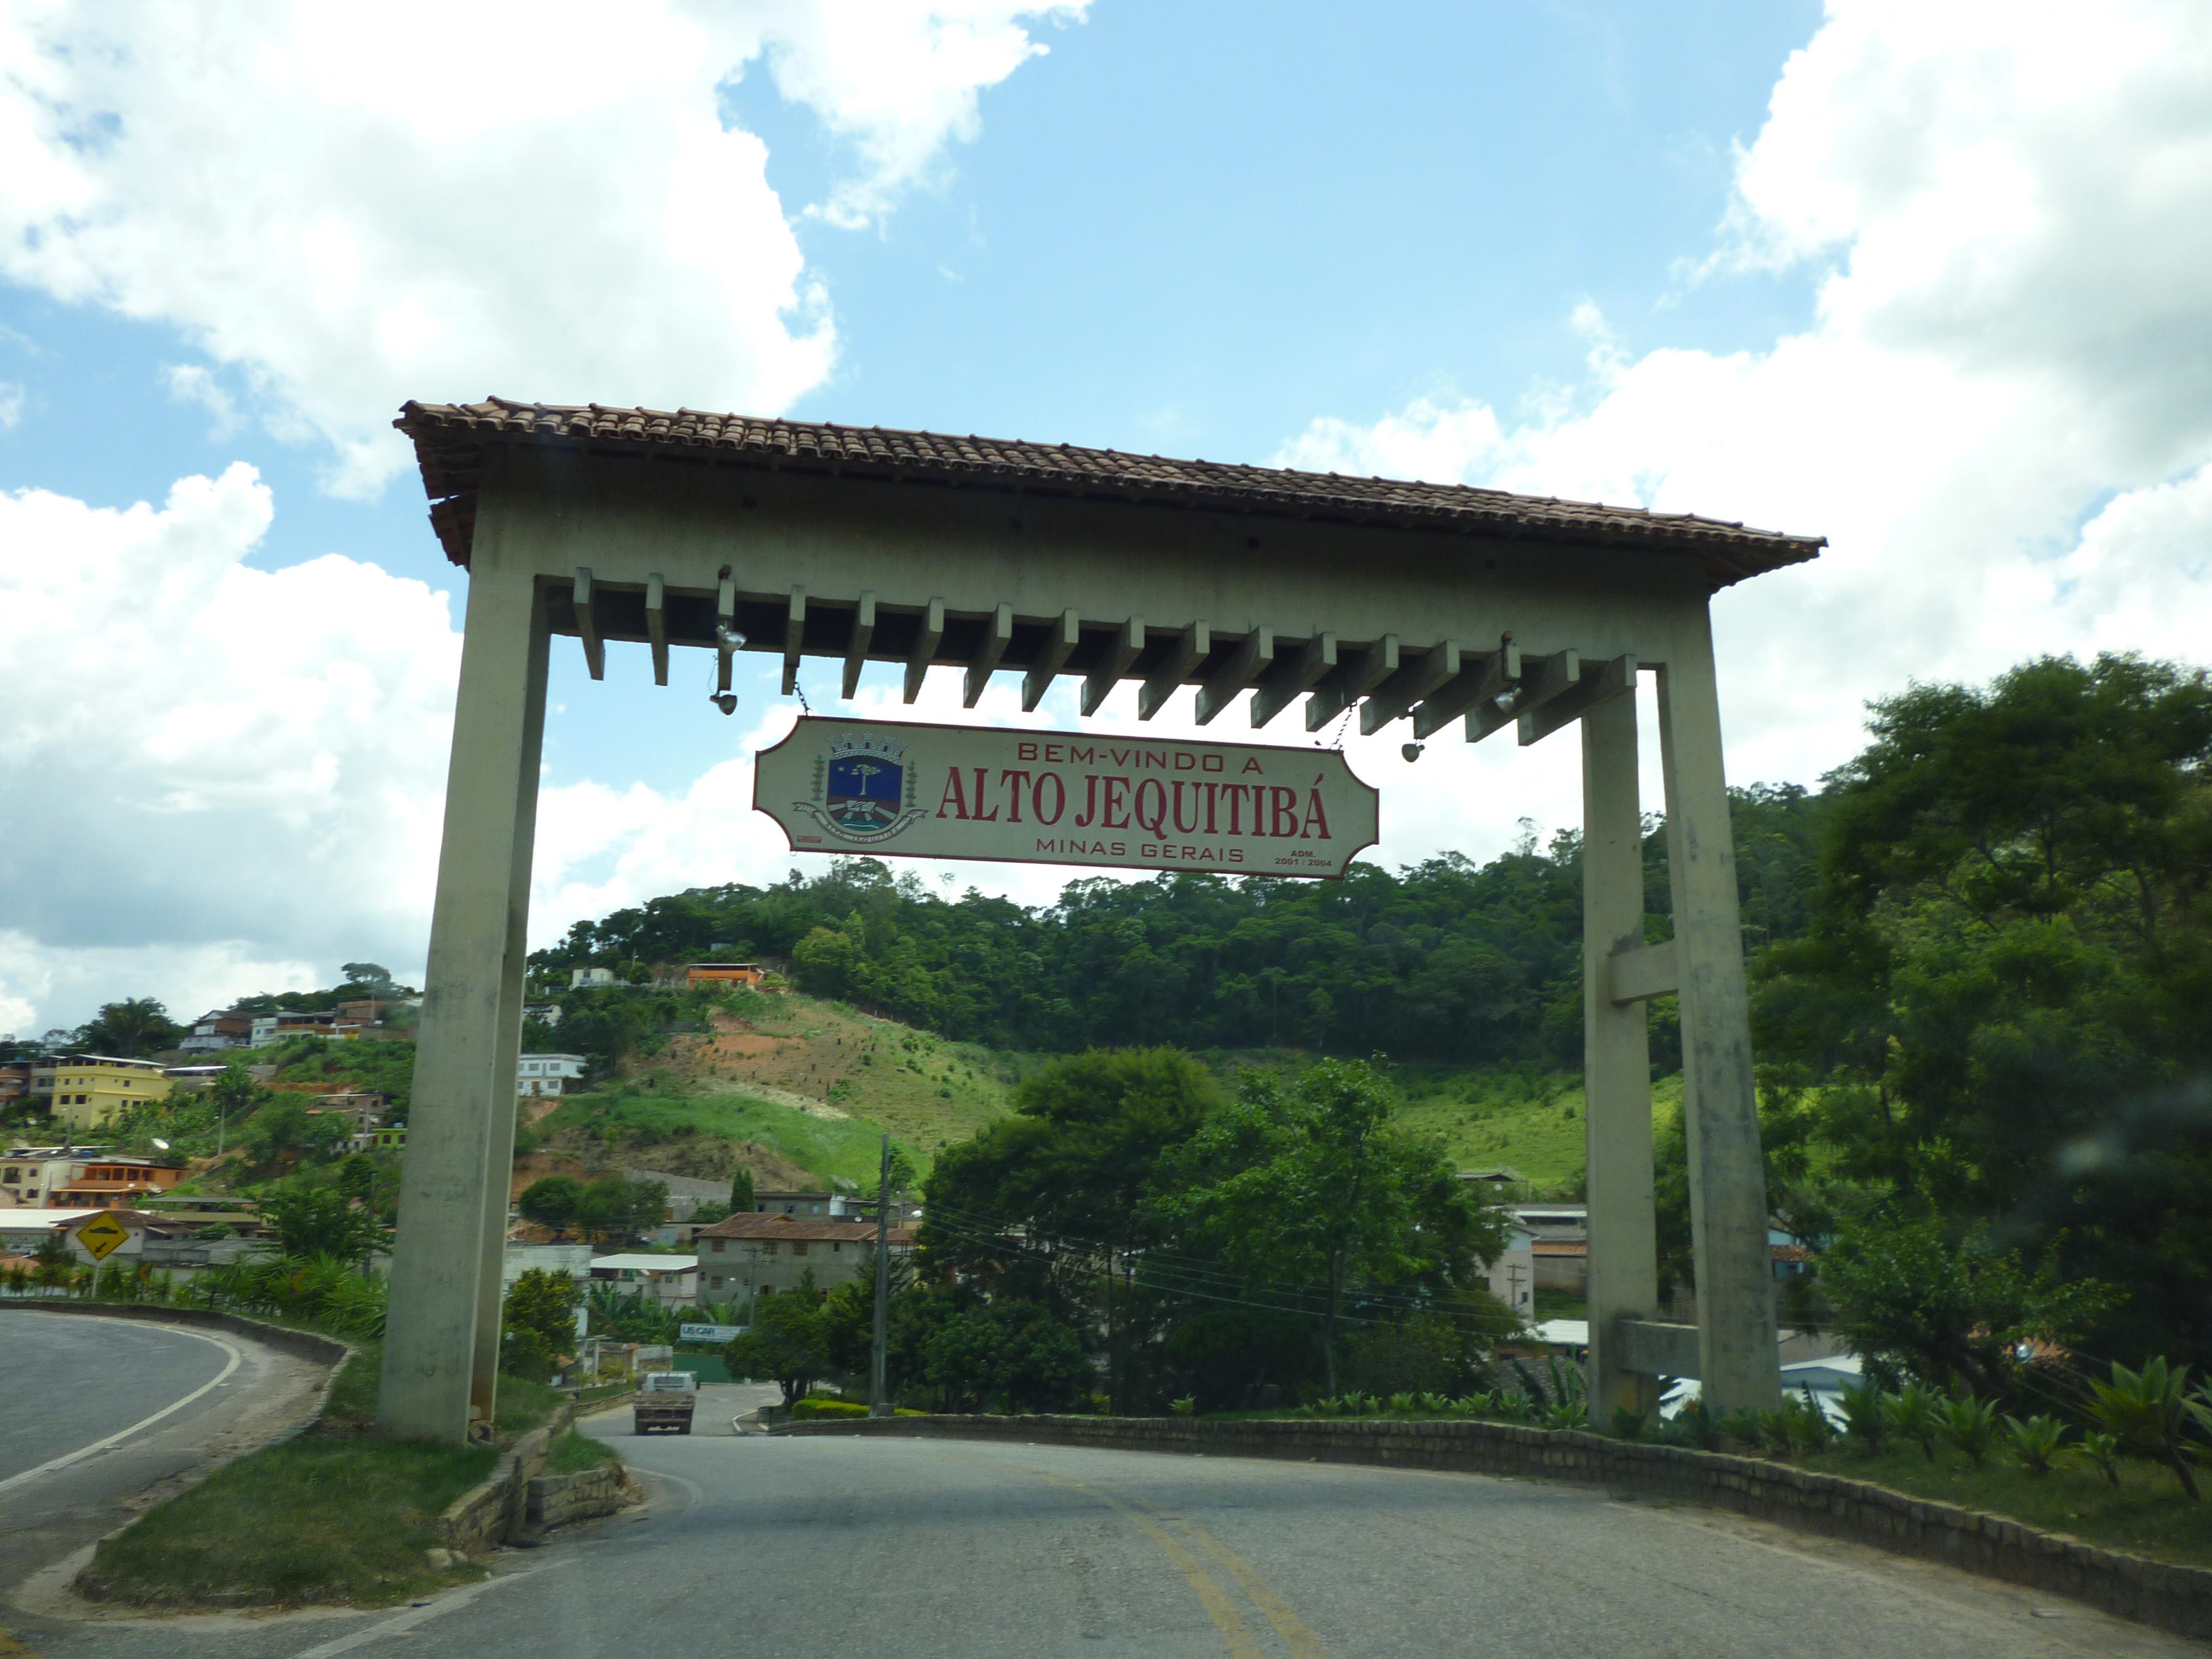 Jequitibá Minas Gerais fonte: upload.wikimedia.org